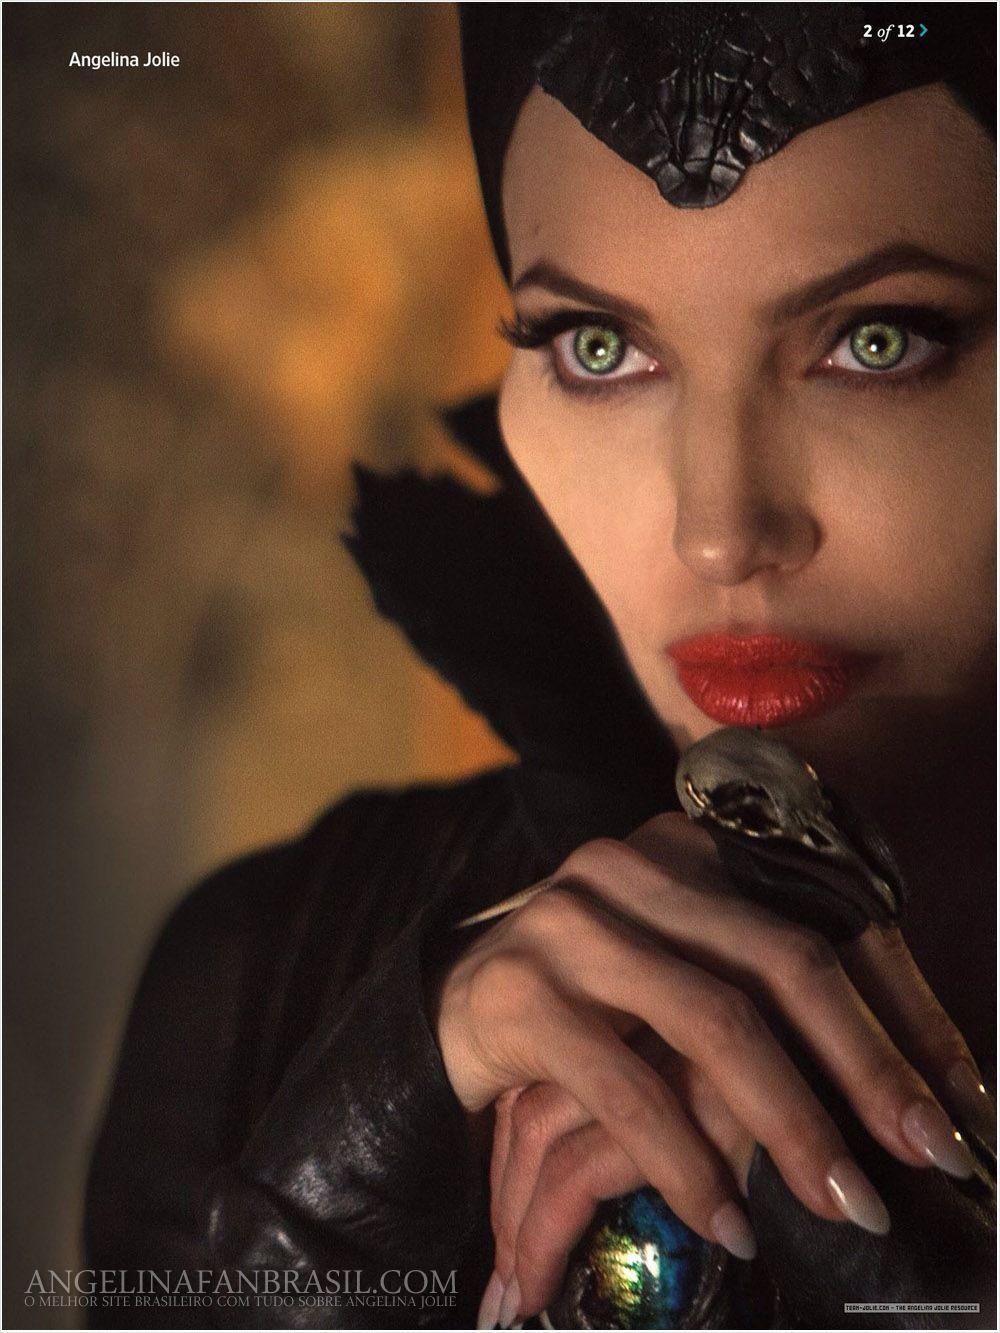 Angelina Jolie As Maleficent Angelina Jolie Malefica